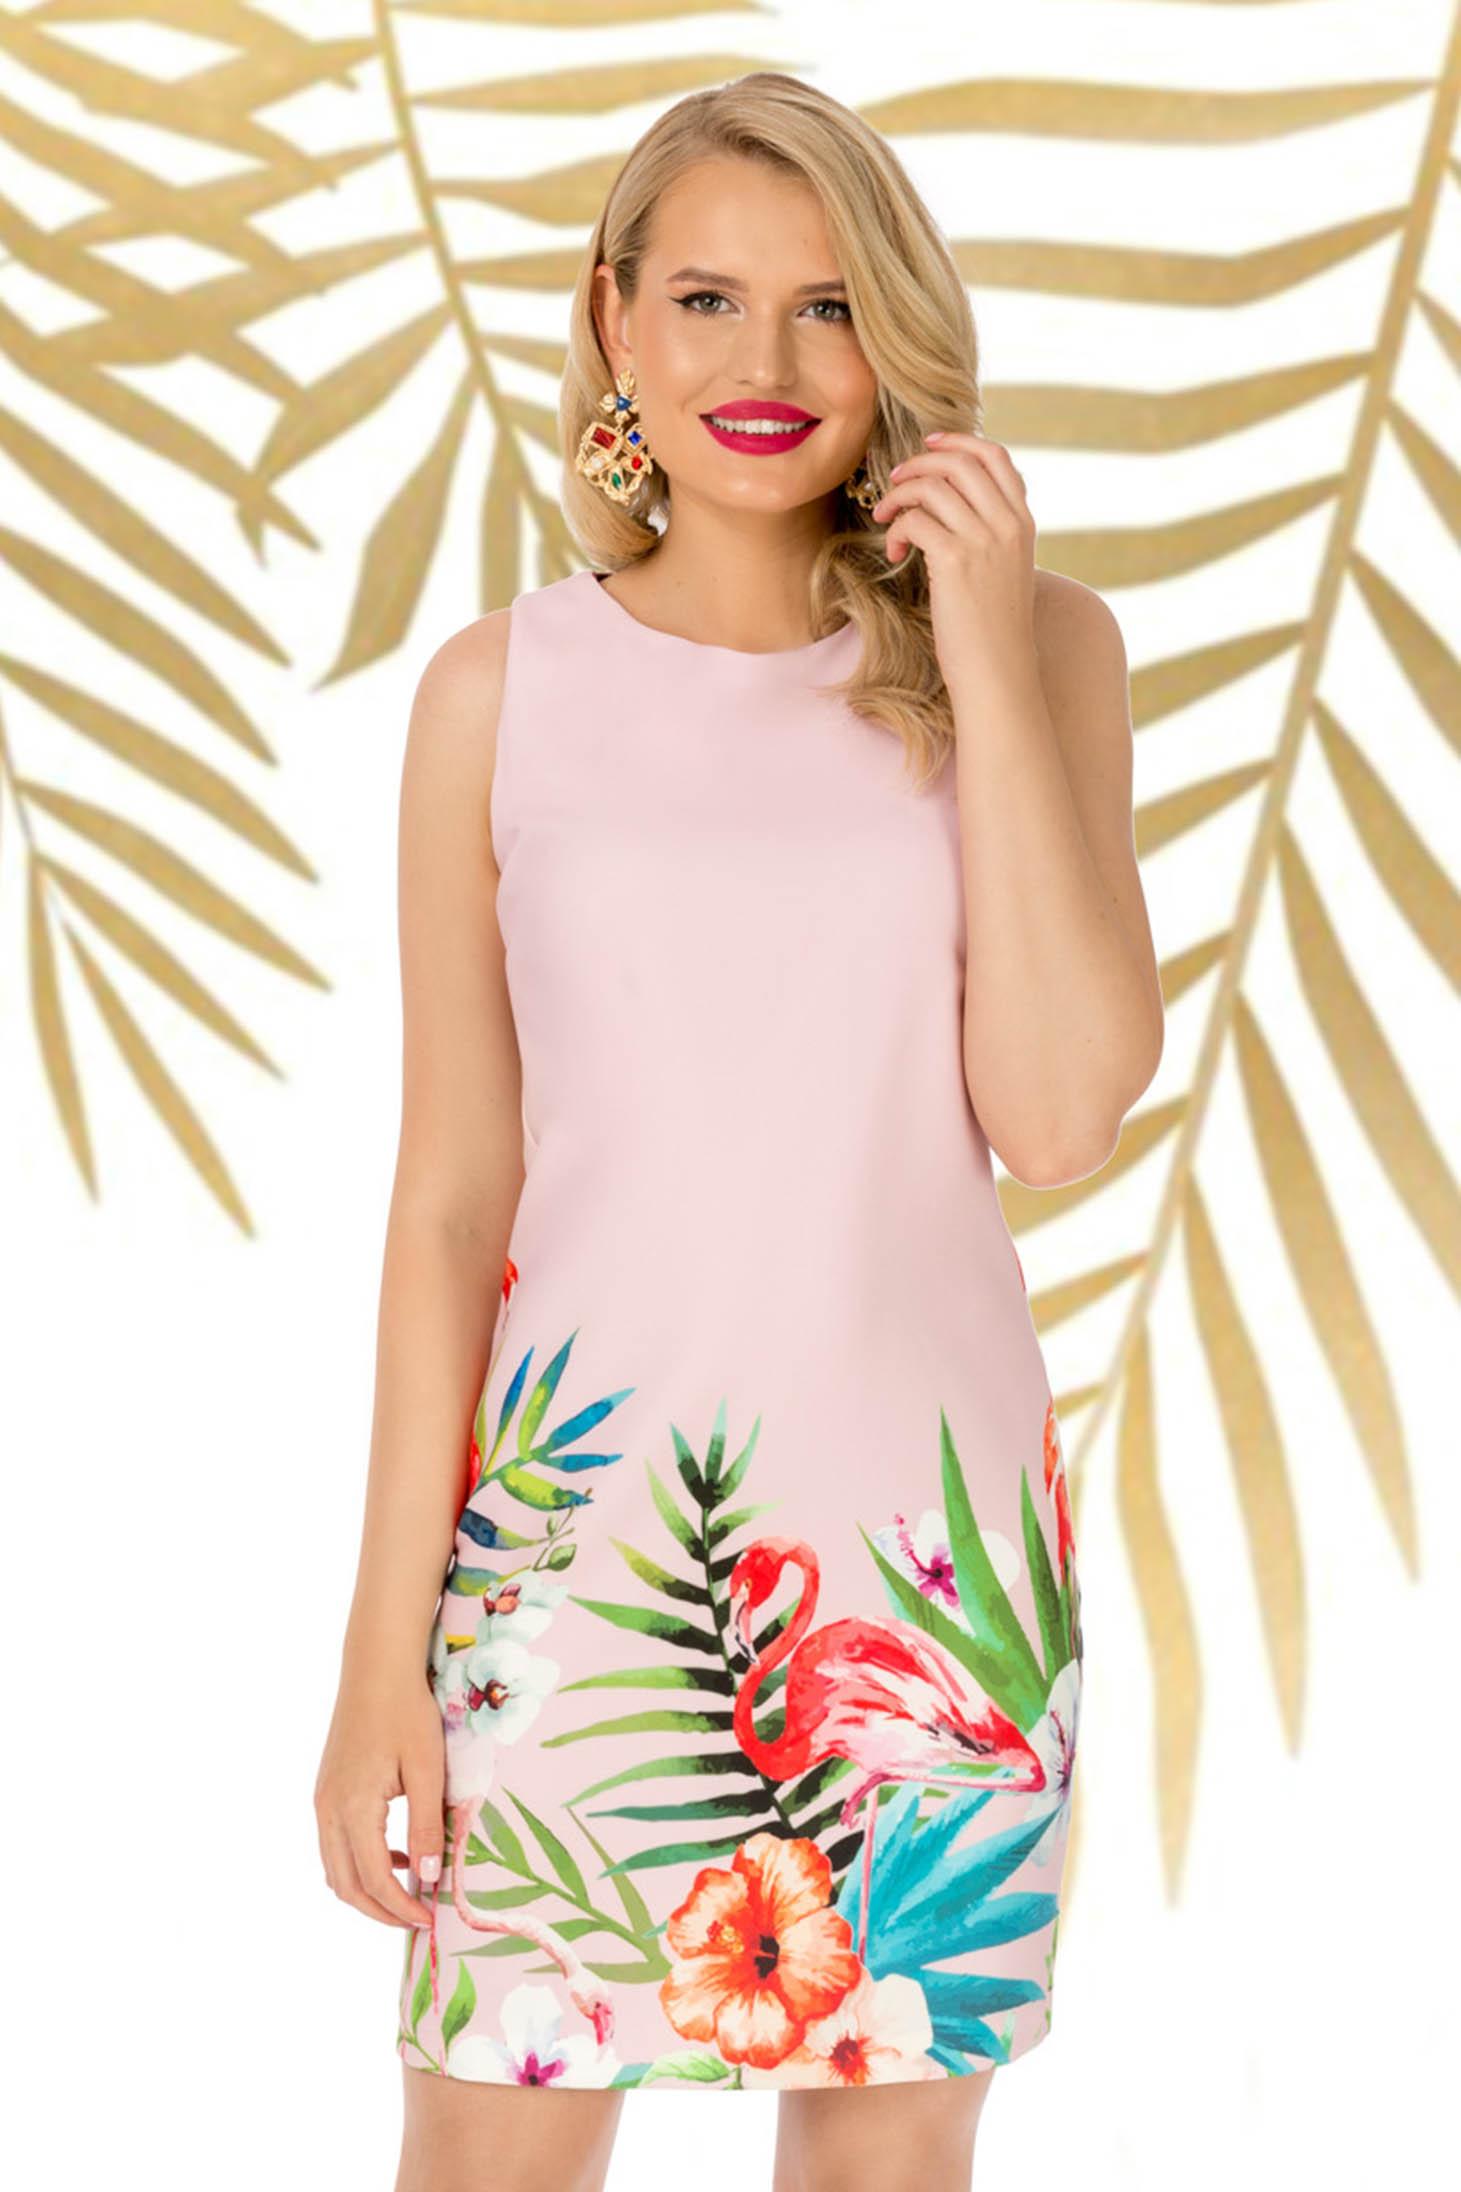 Rochie PrettyGirl roz prafuit de zi fara maneci cu un croi drept din material usor elastic cu imprimeu floral